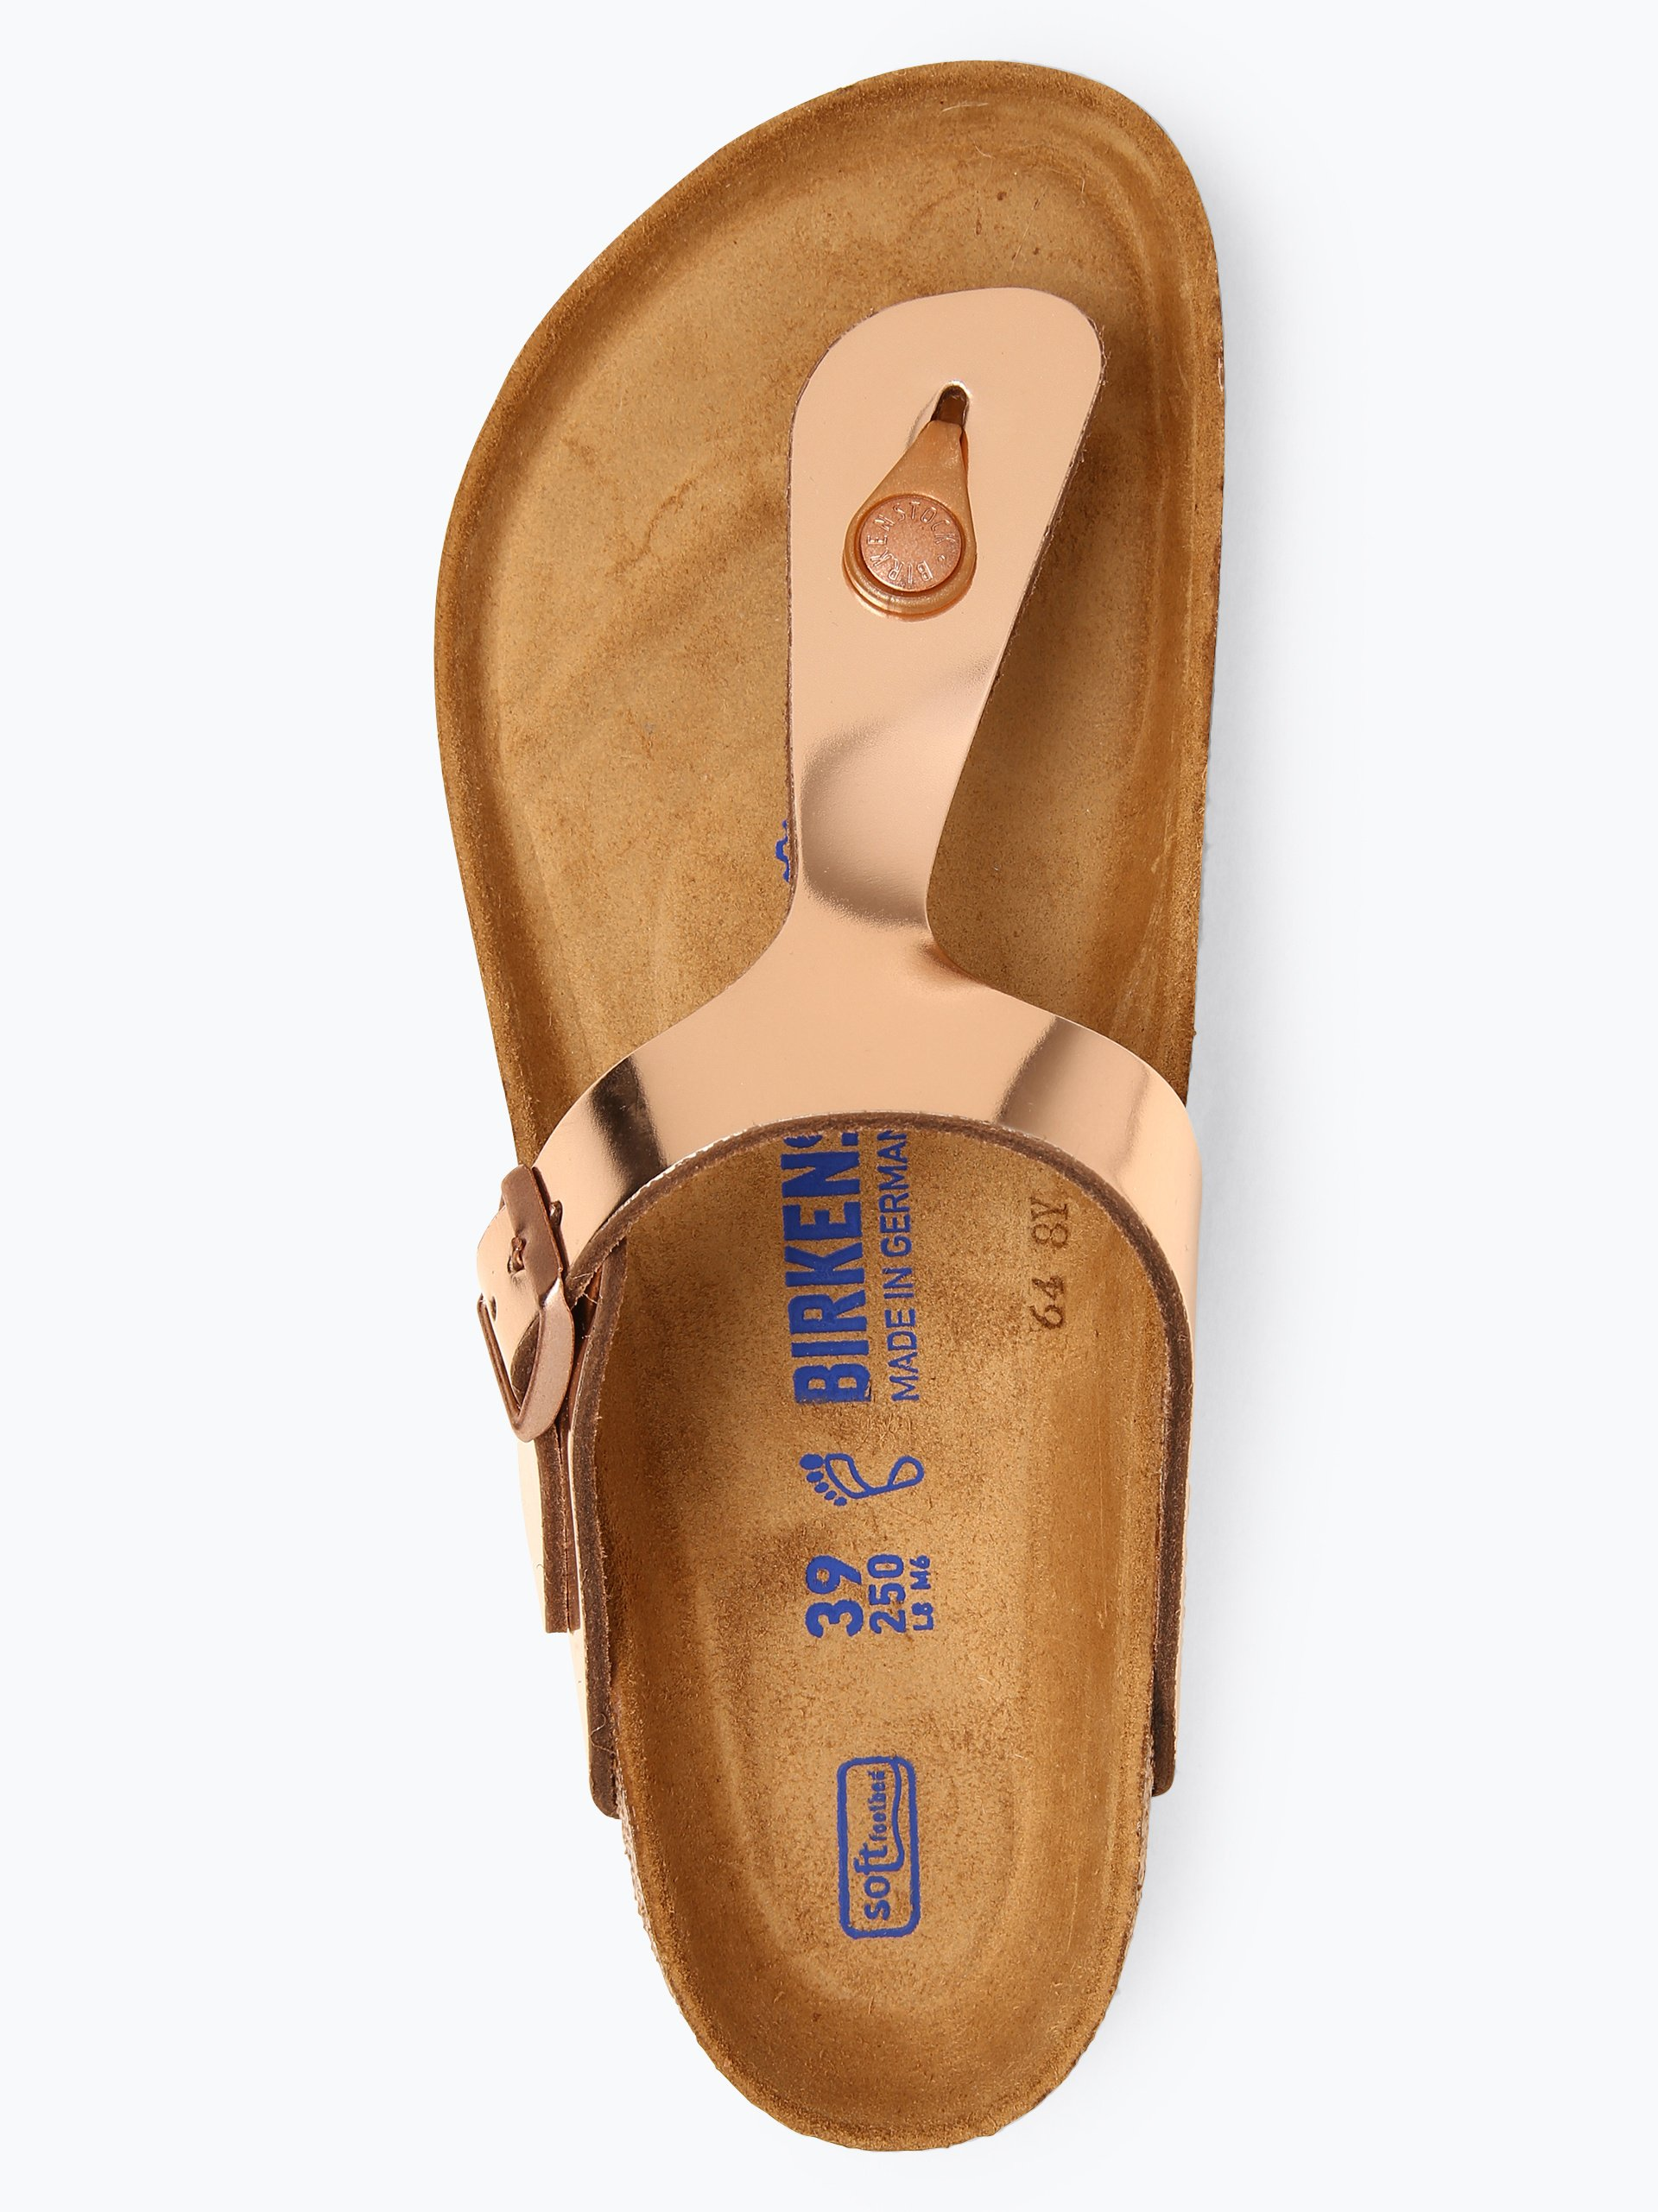 Birkenstock Damen Sandalen aus Leder - Gizeh BS